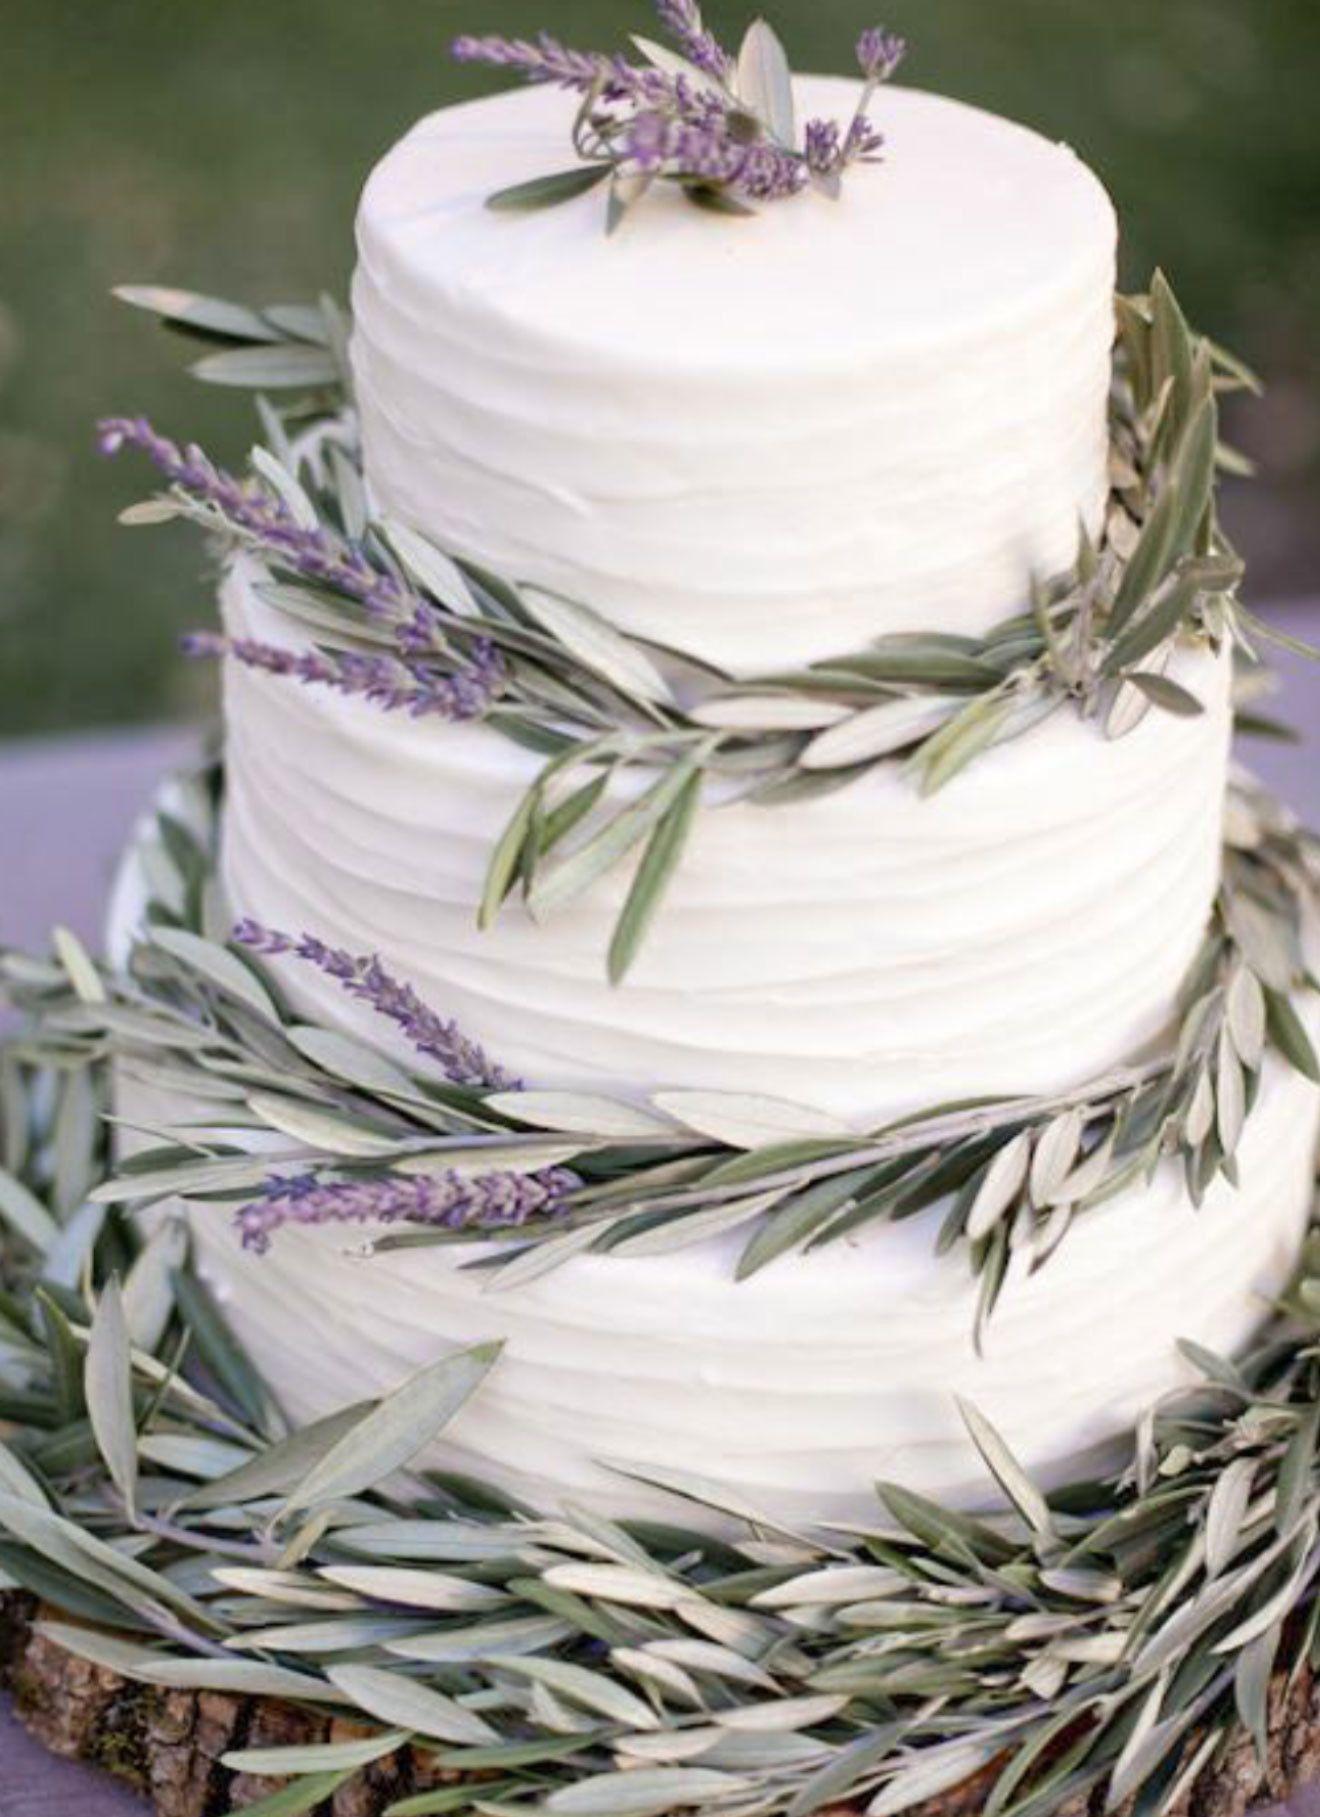 7 Delicious Vegan Wedding Cakes | Entertaining treats | Wedding